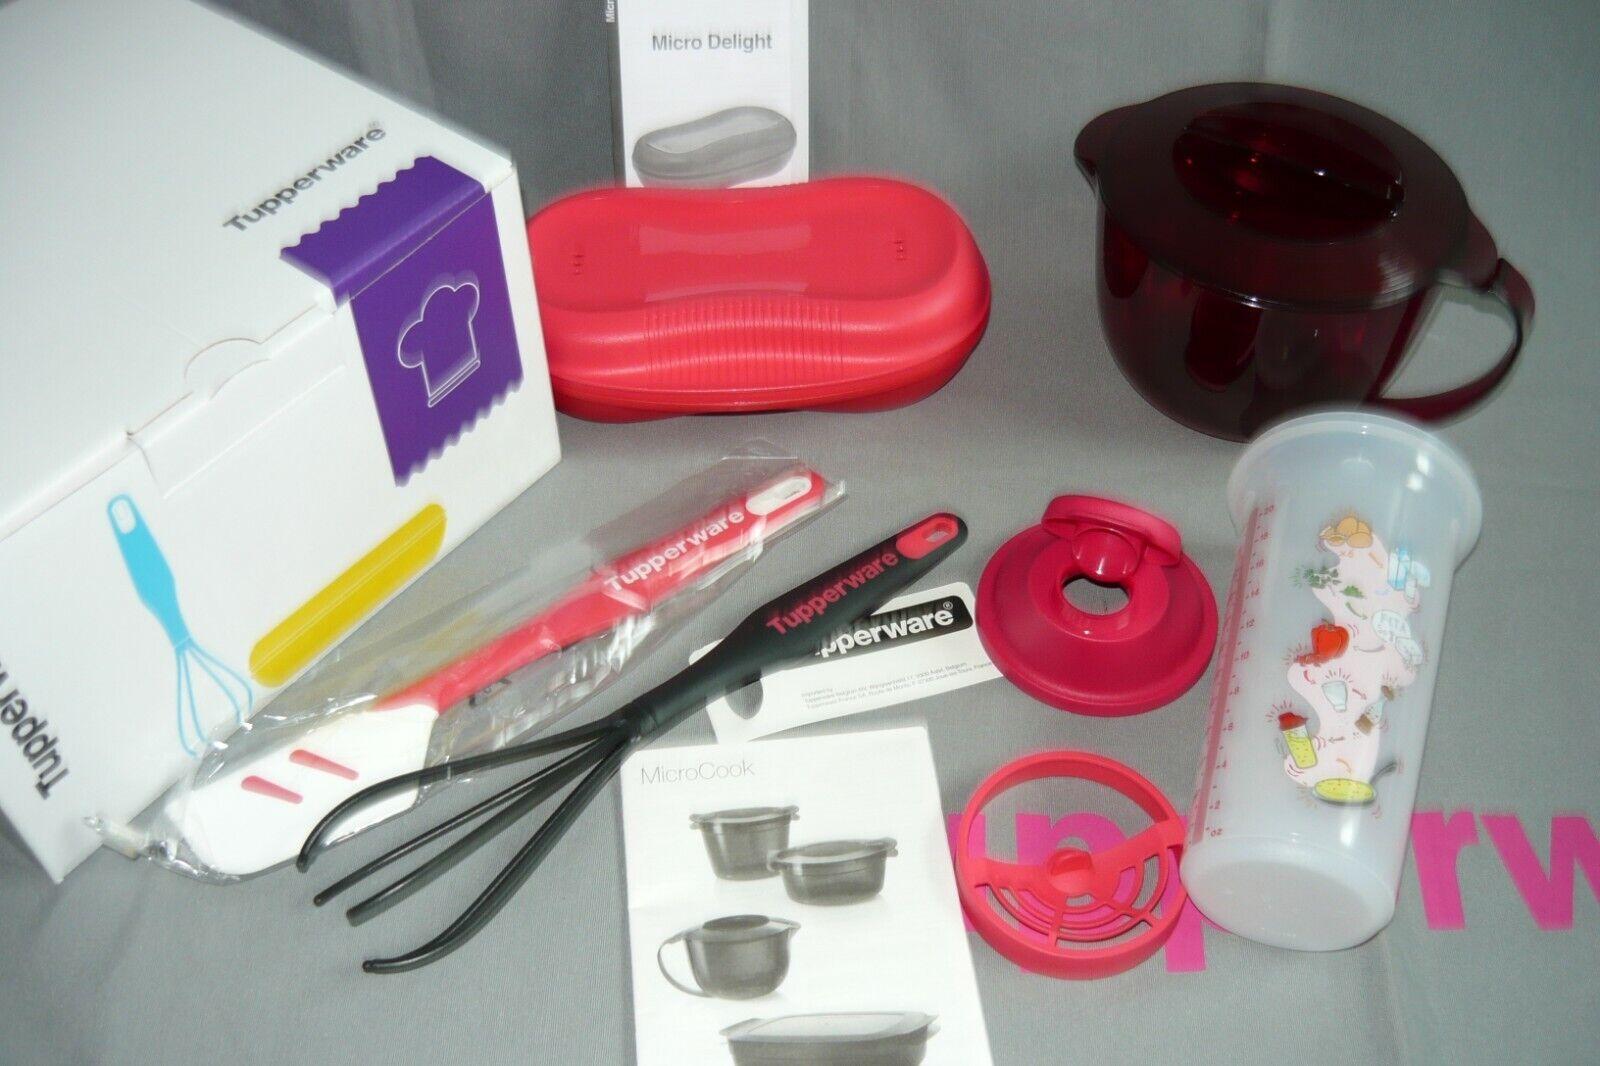 Tupperware Mikrowellen-Starter-Set rosa /rot 5tlg. in der Geschenk Box - NEU/OVP